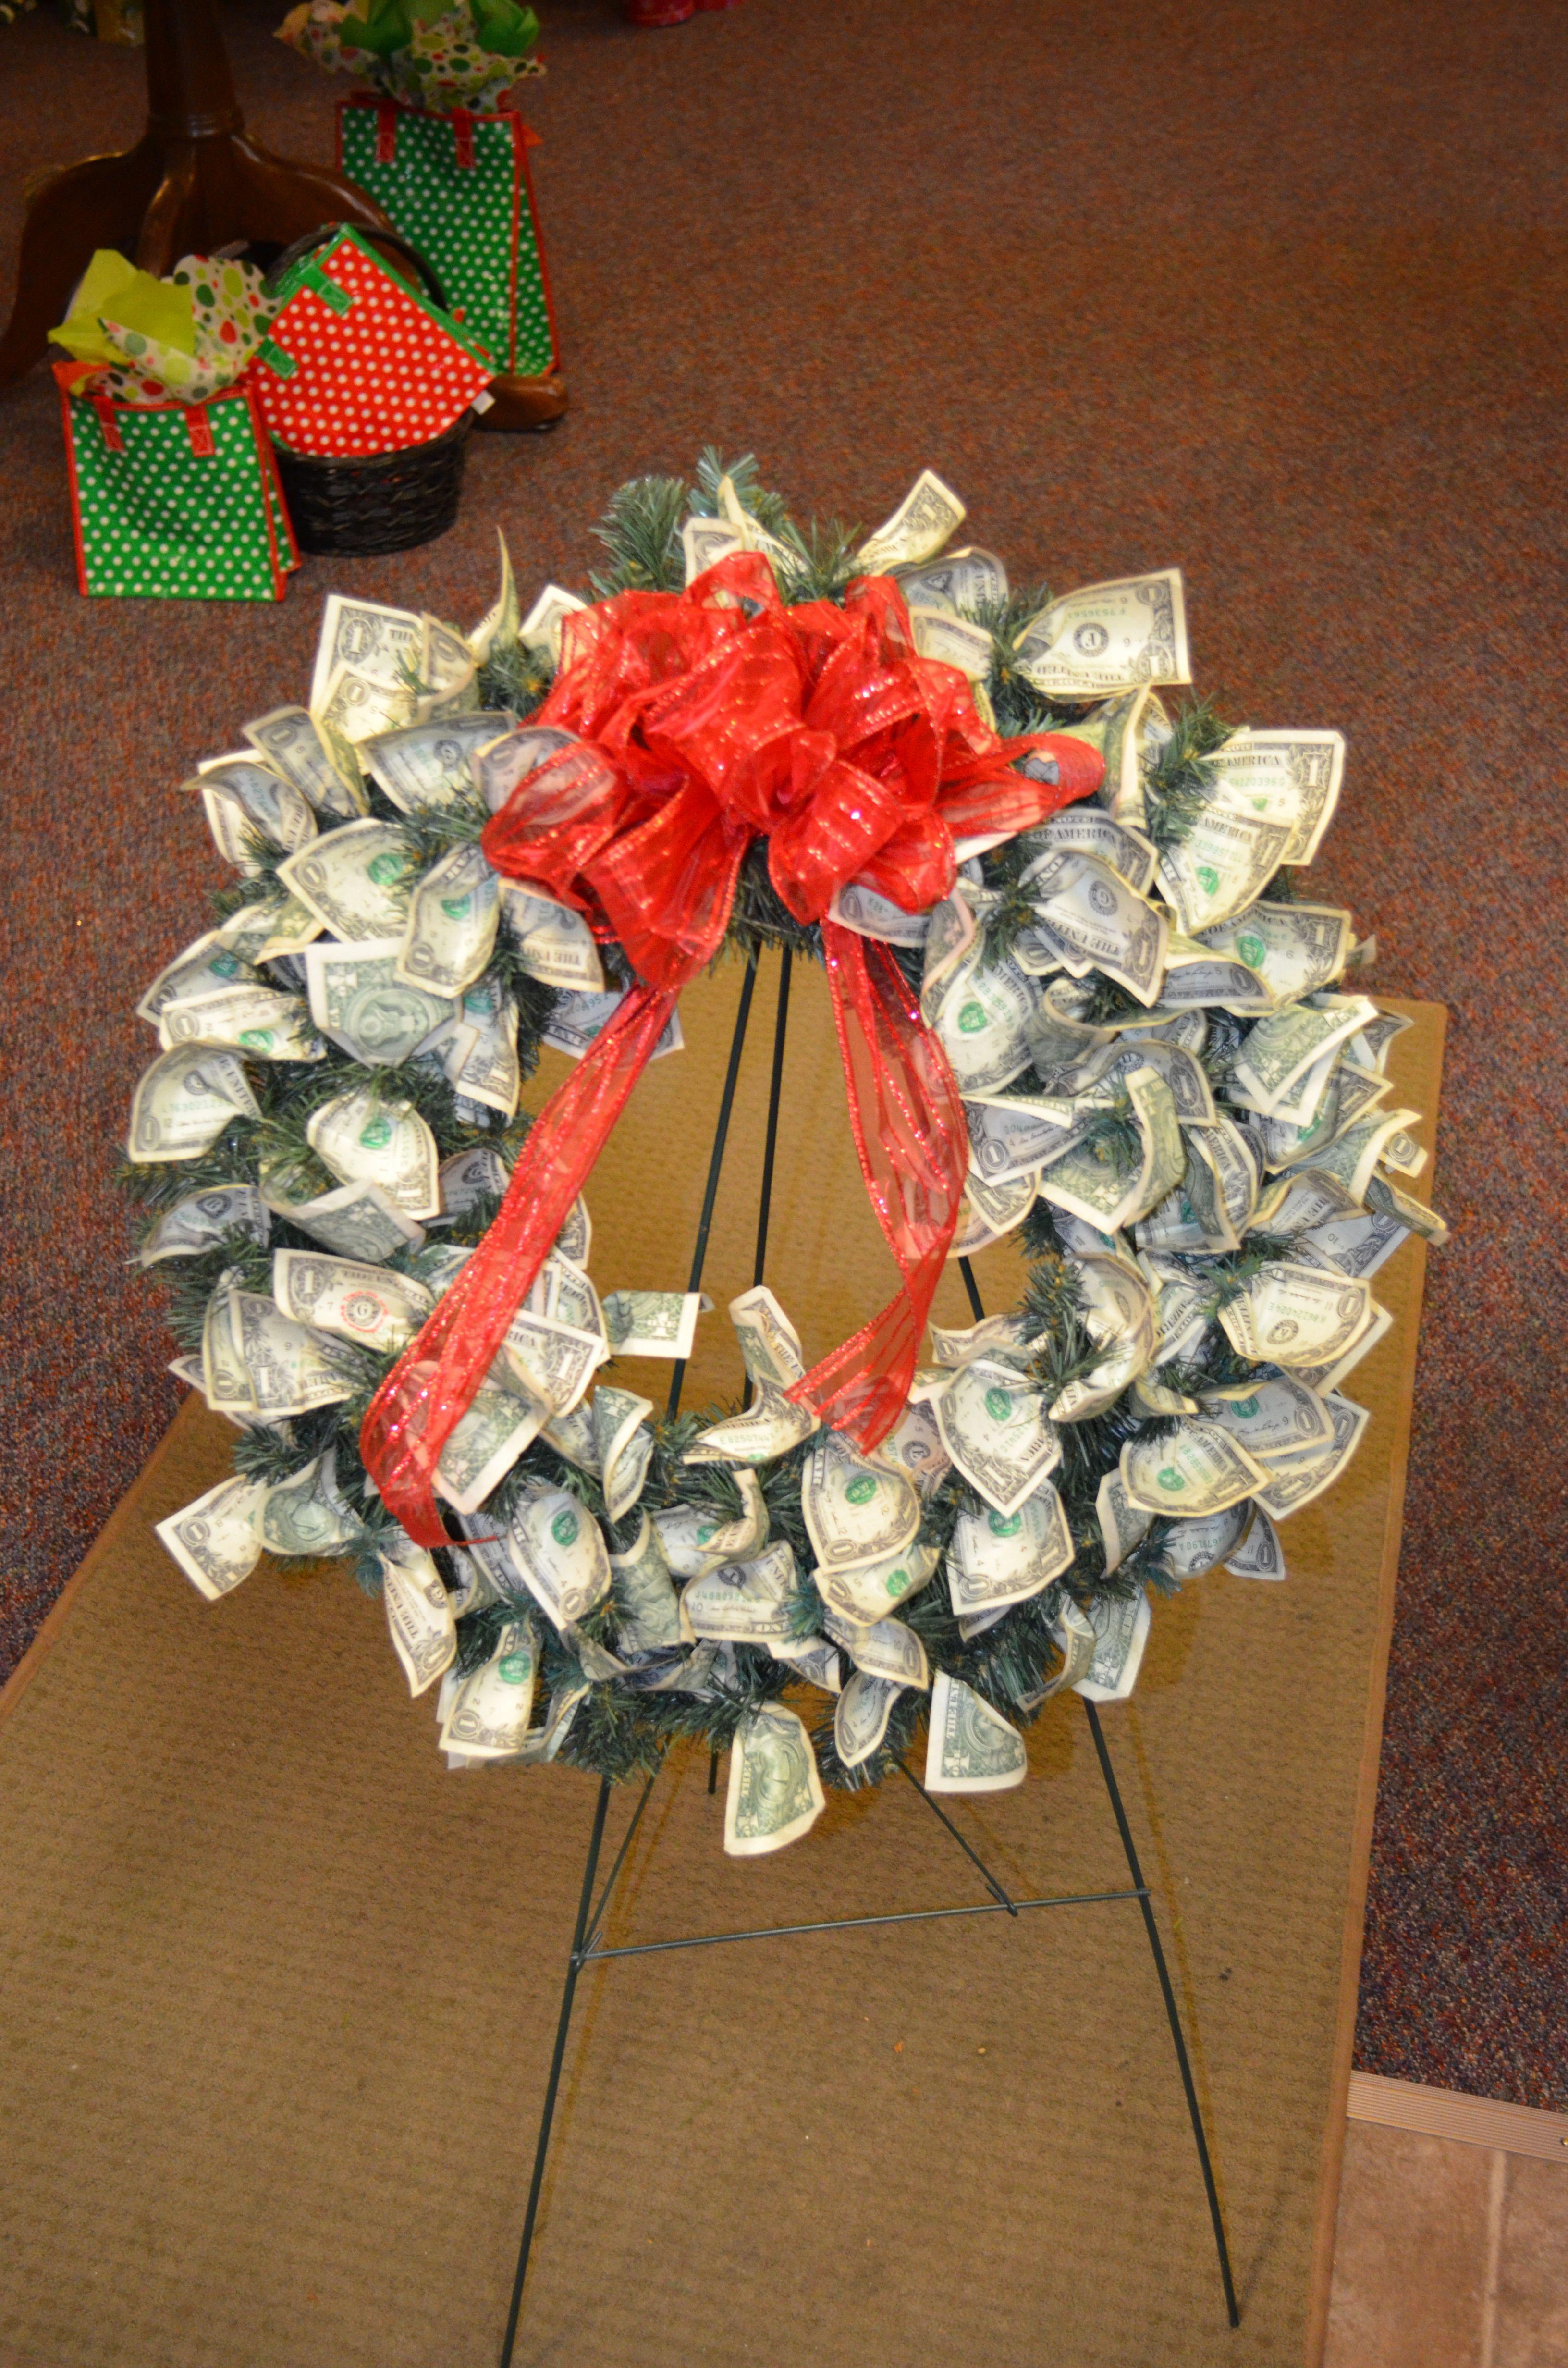 Custom made money wreath 70 dollar bills for a 70th birthday custom made money wreath 70 dollar bills for a 70th birthday sarahs flowers dhlflorist Choice Image